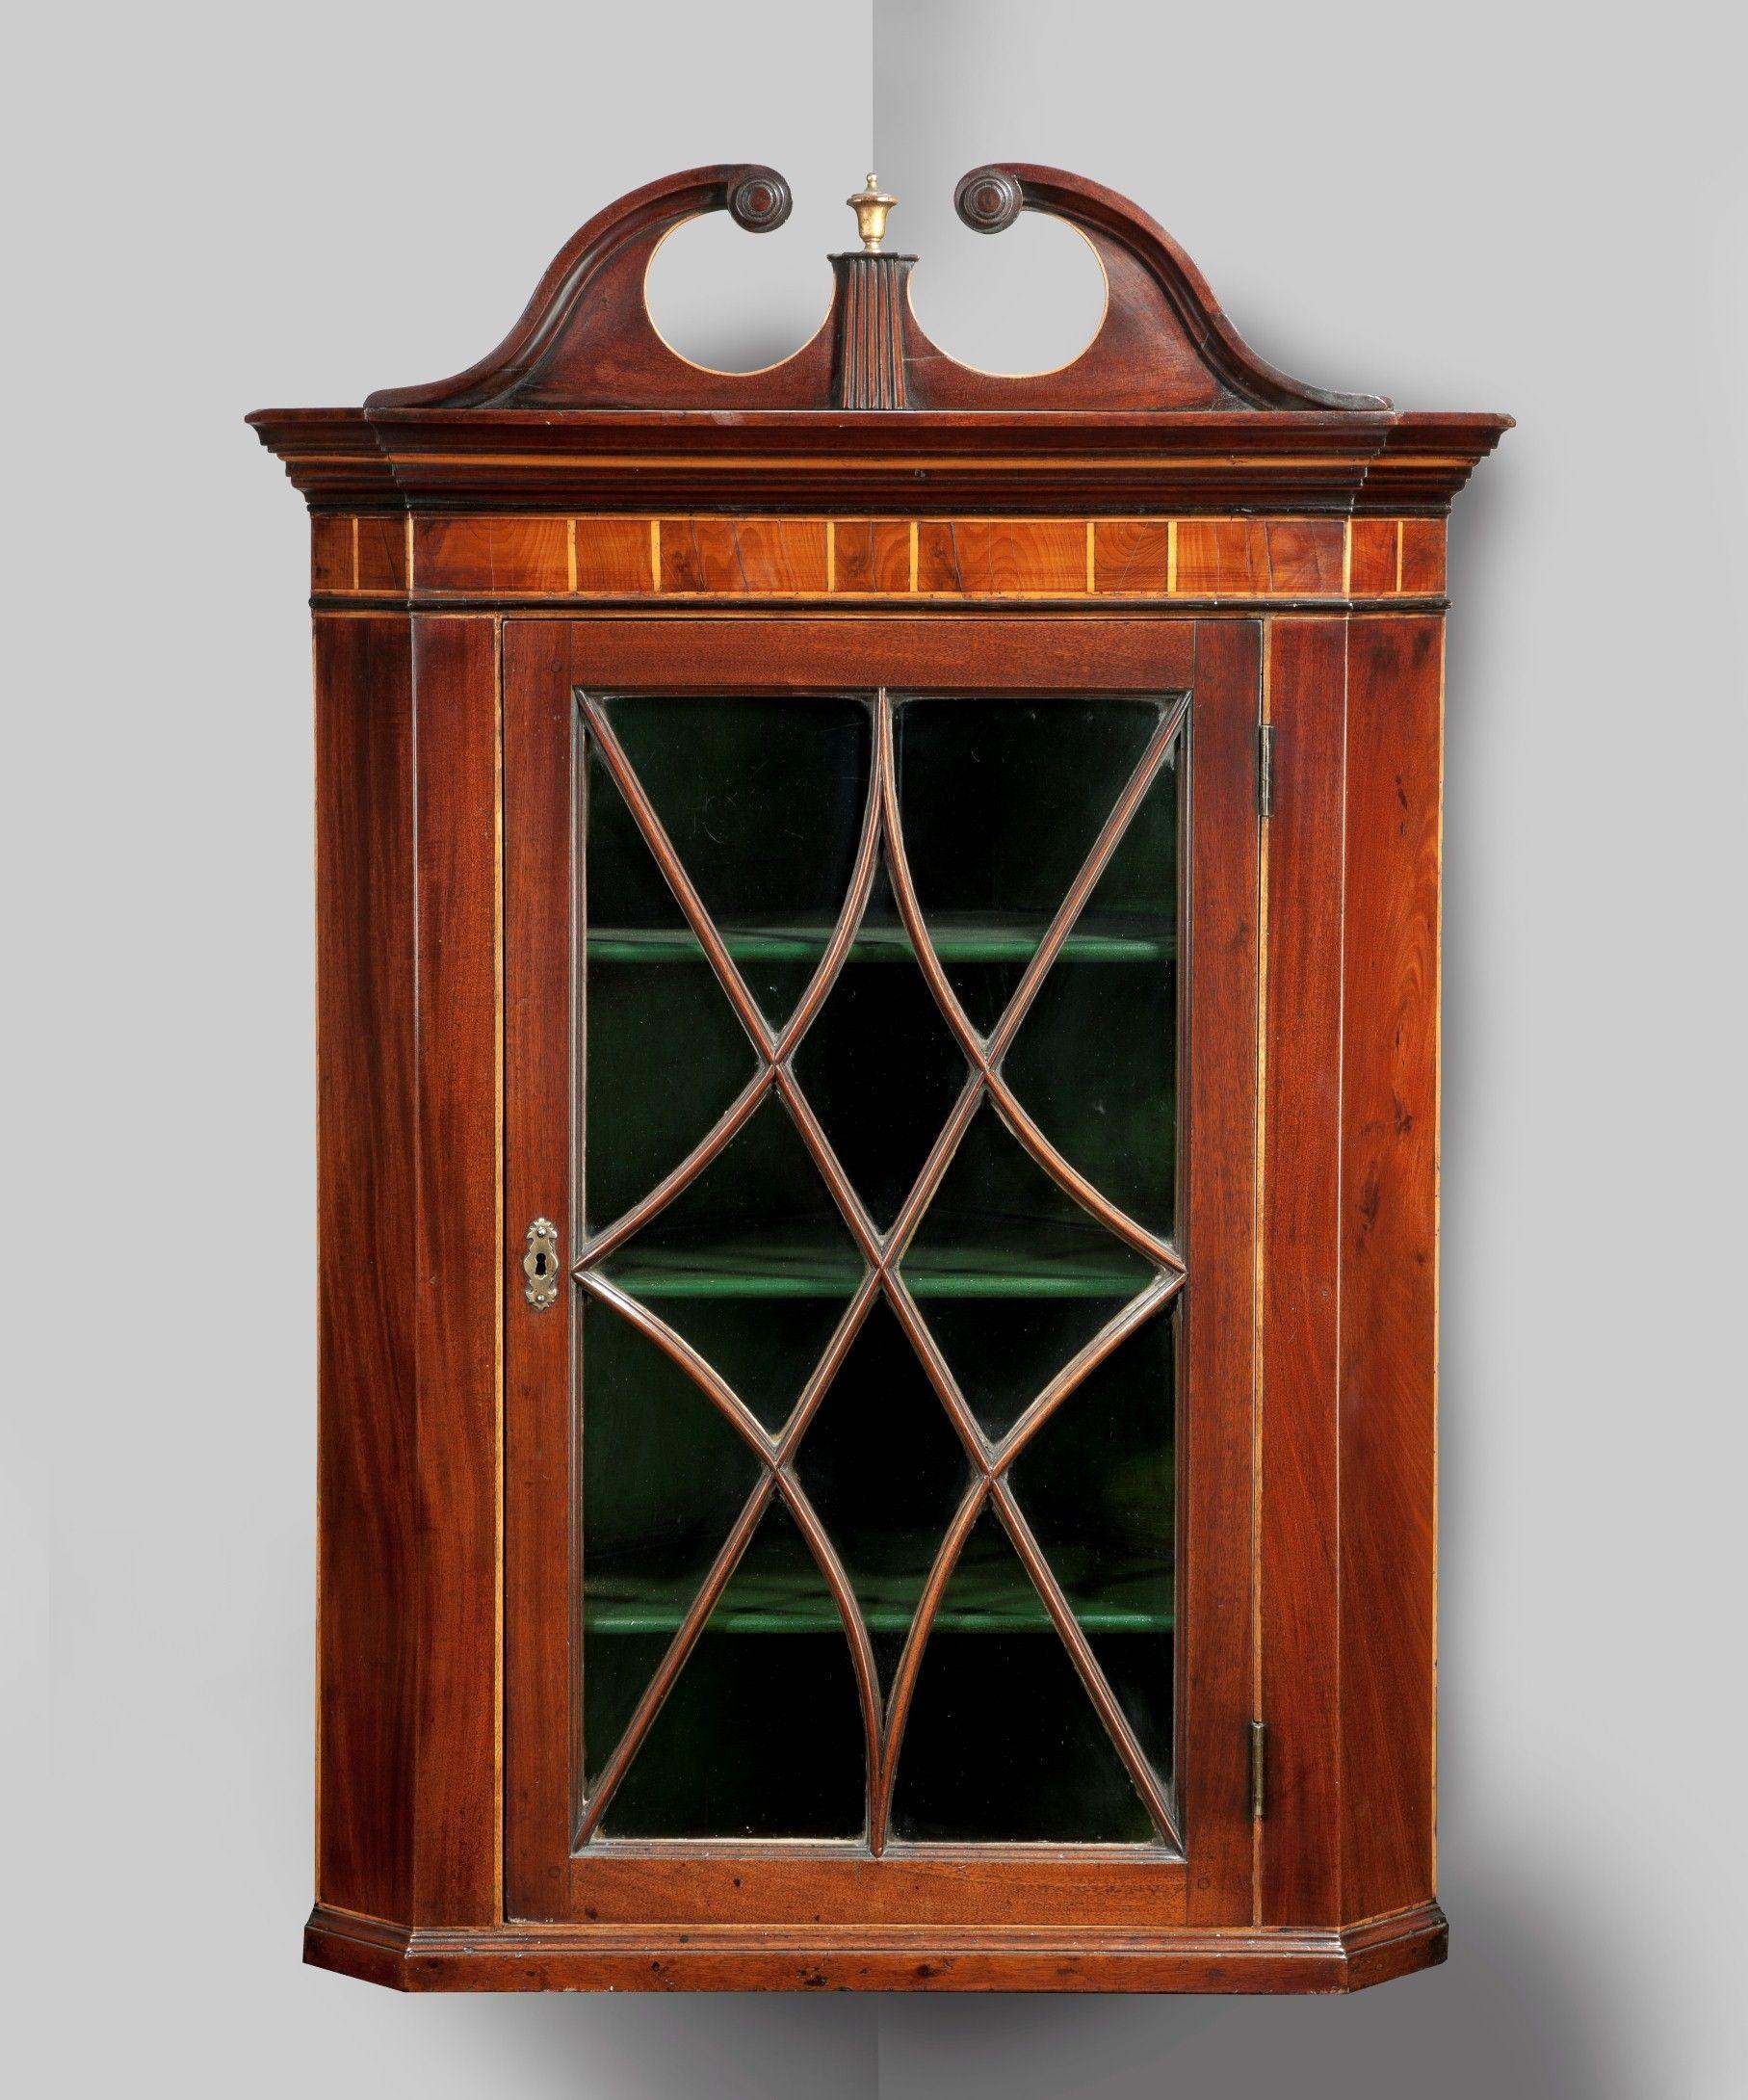 English Antique Georgian Furniture Reindeer Antiques Bibliotheque Antique Meubles Anciens Anglais